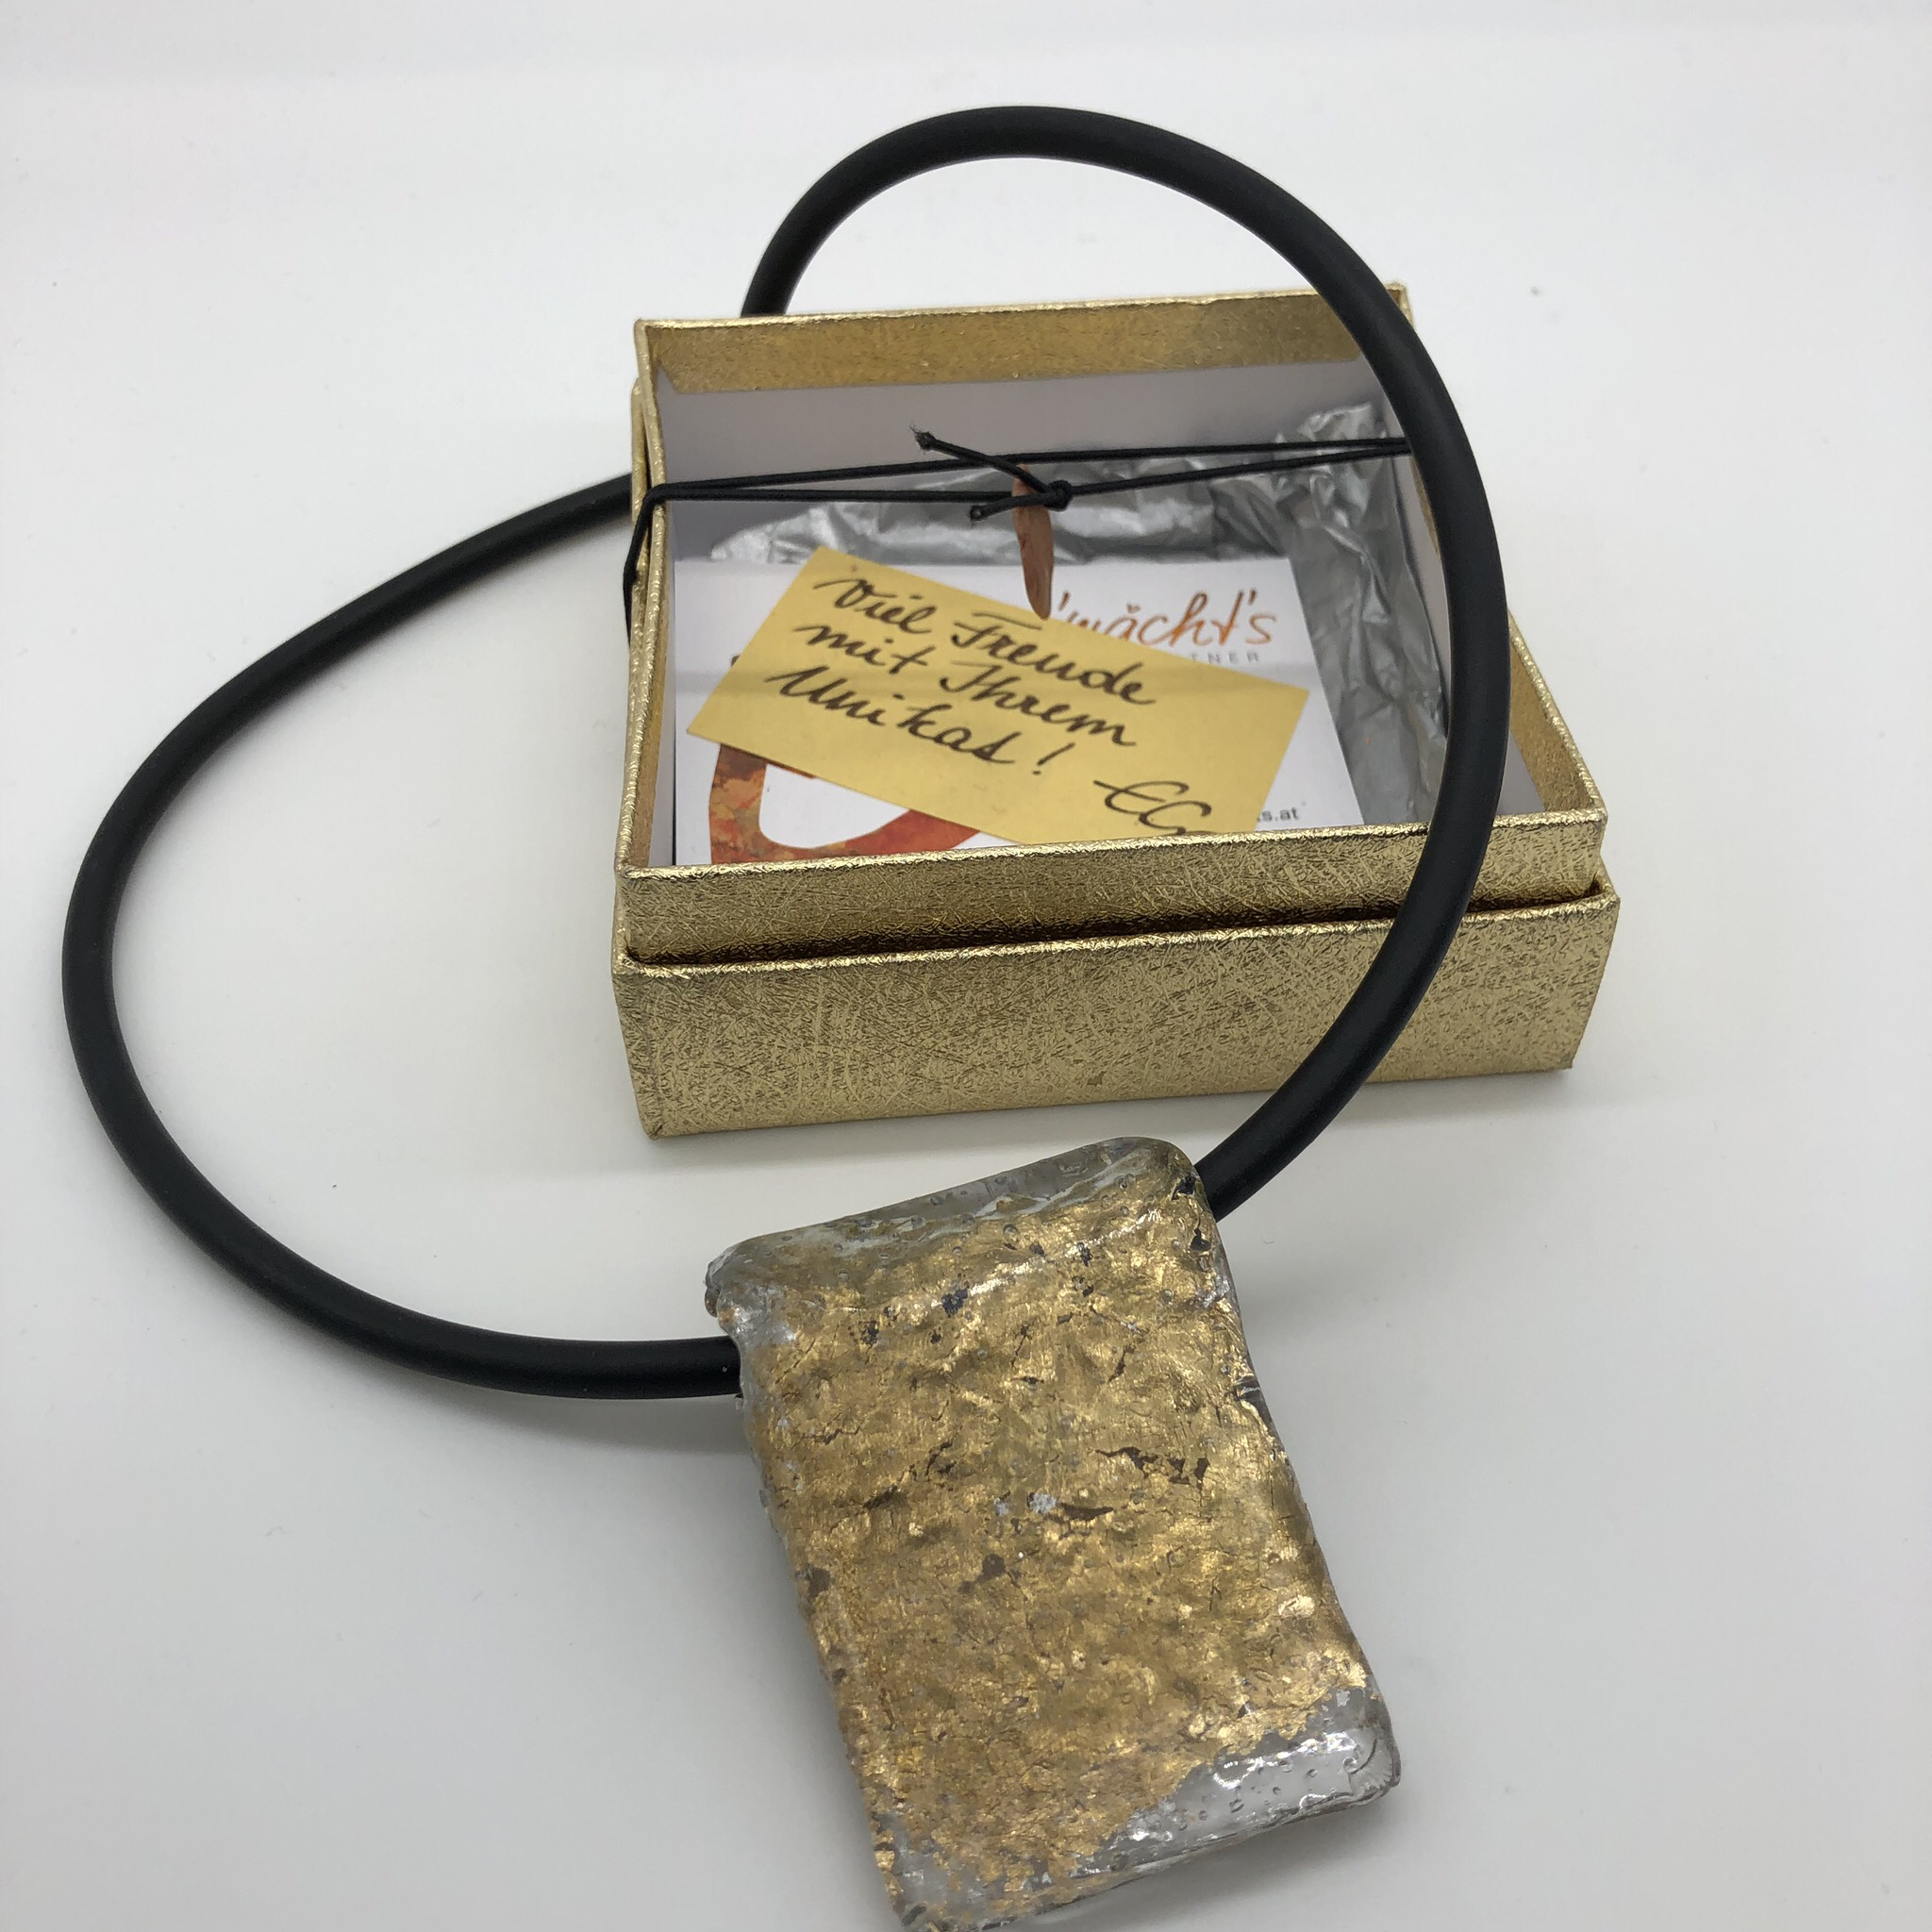 Anhänger Kunststoffgranulat gold Blattmetall - beidseitig tragbar 25175